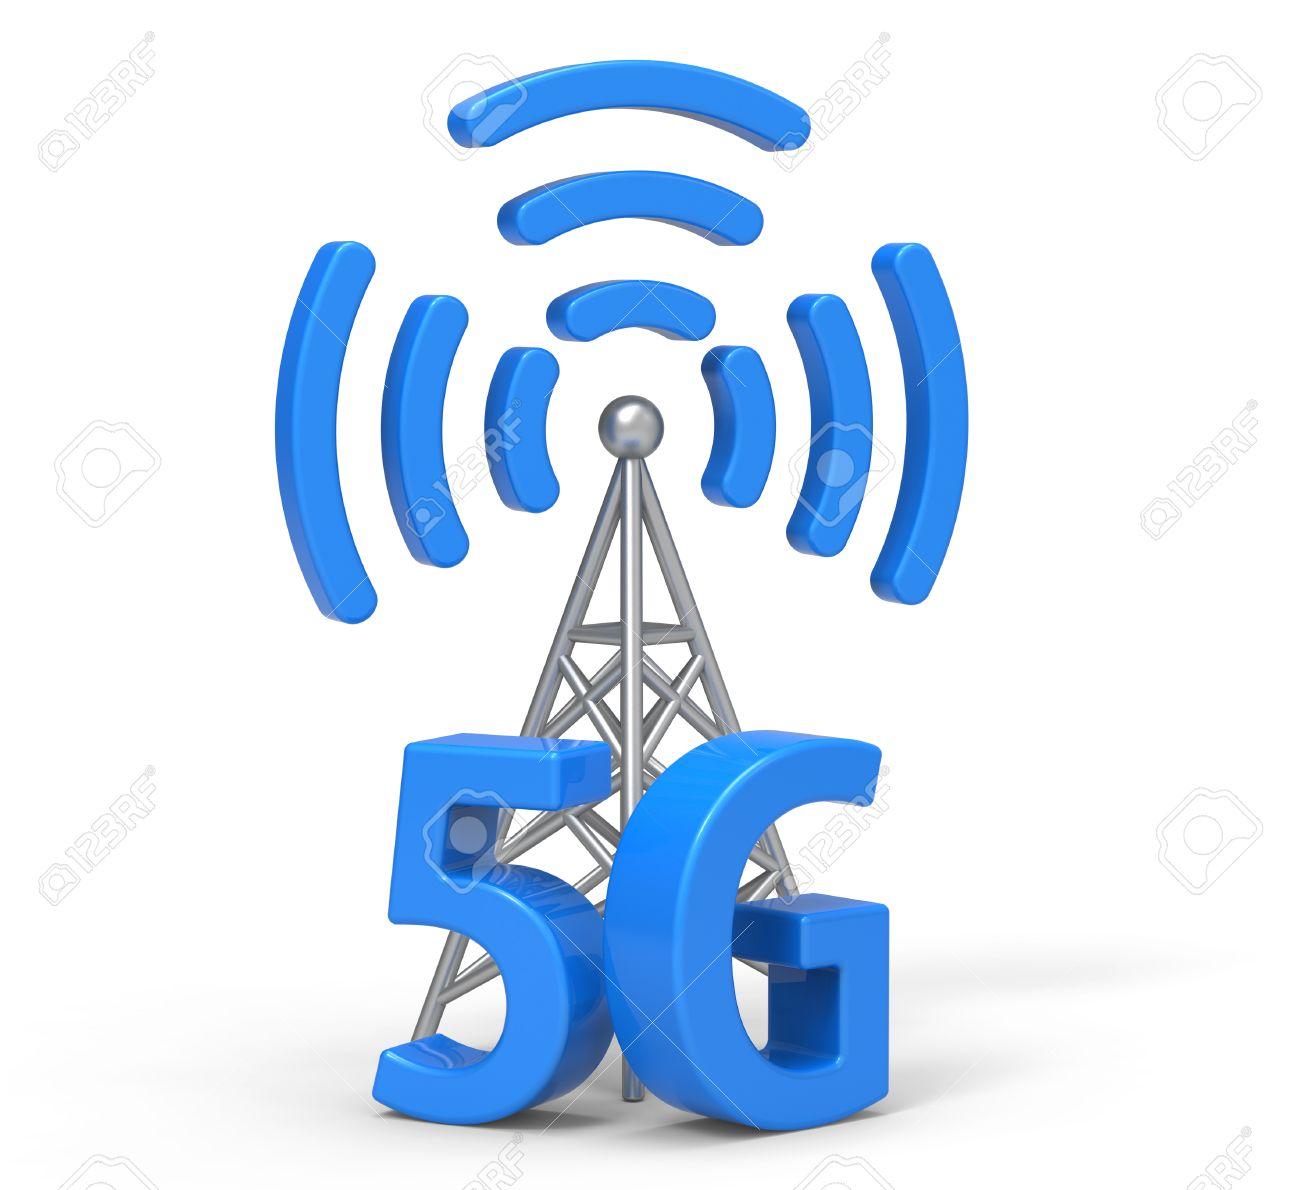 3d 5G With Antenna, Wireless Communication Technology Stock Photo ...